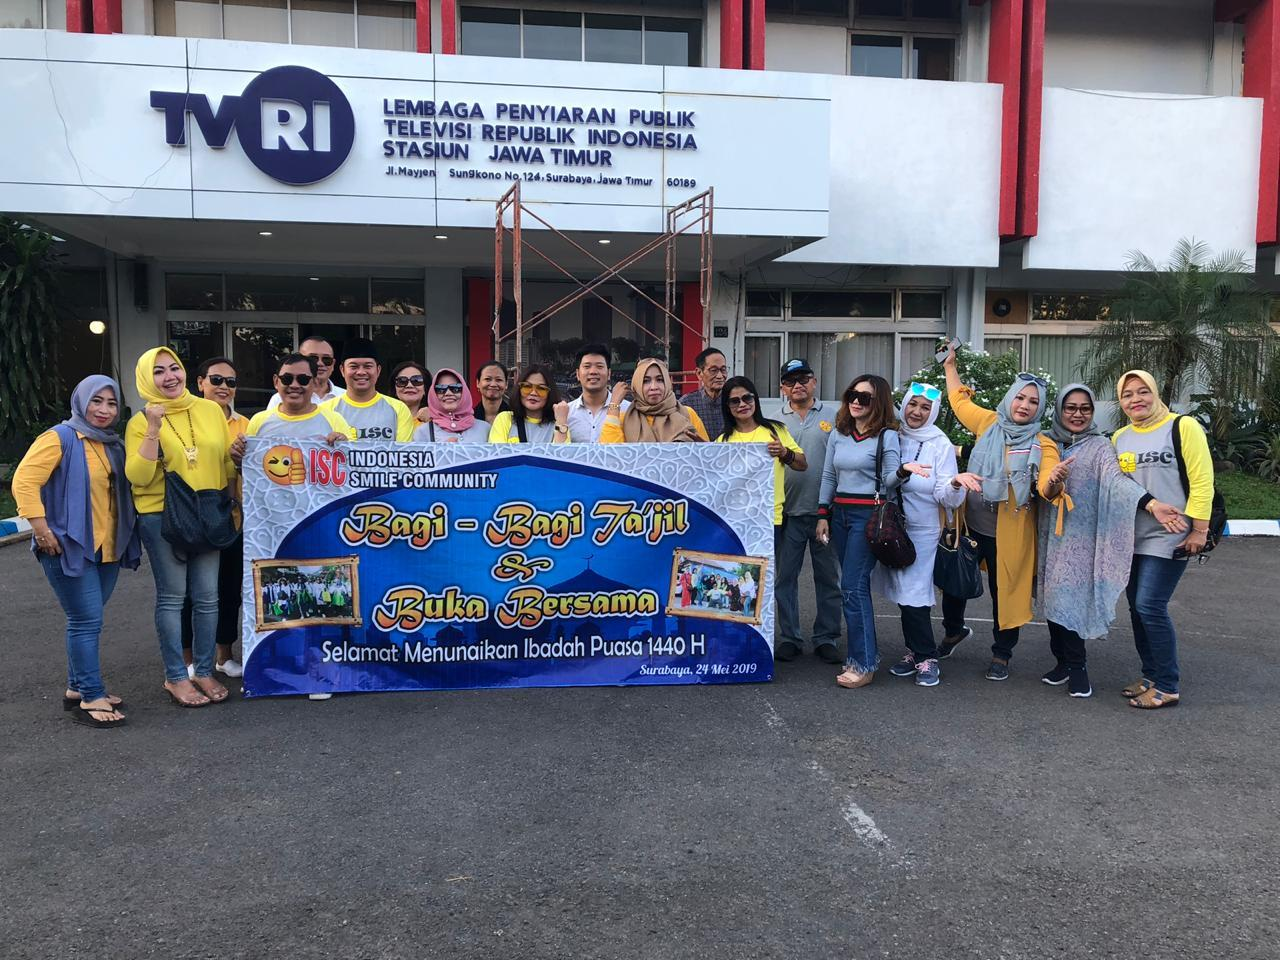 ISC Kembali Berbagi Ribuan Takjil di Surabaya